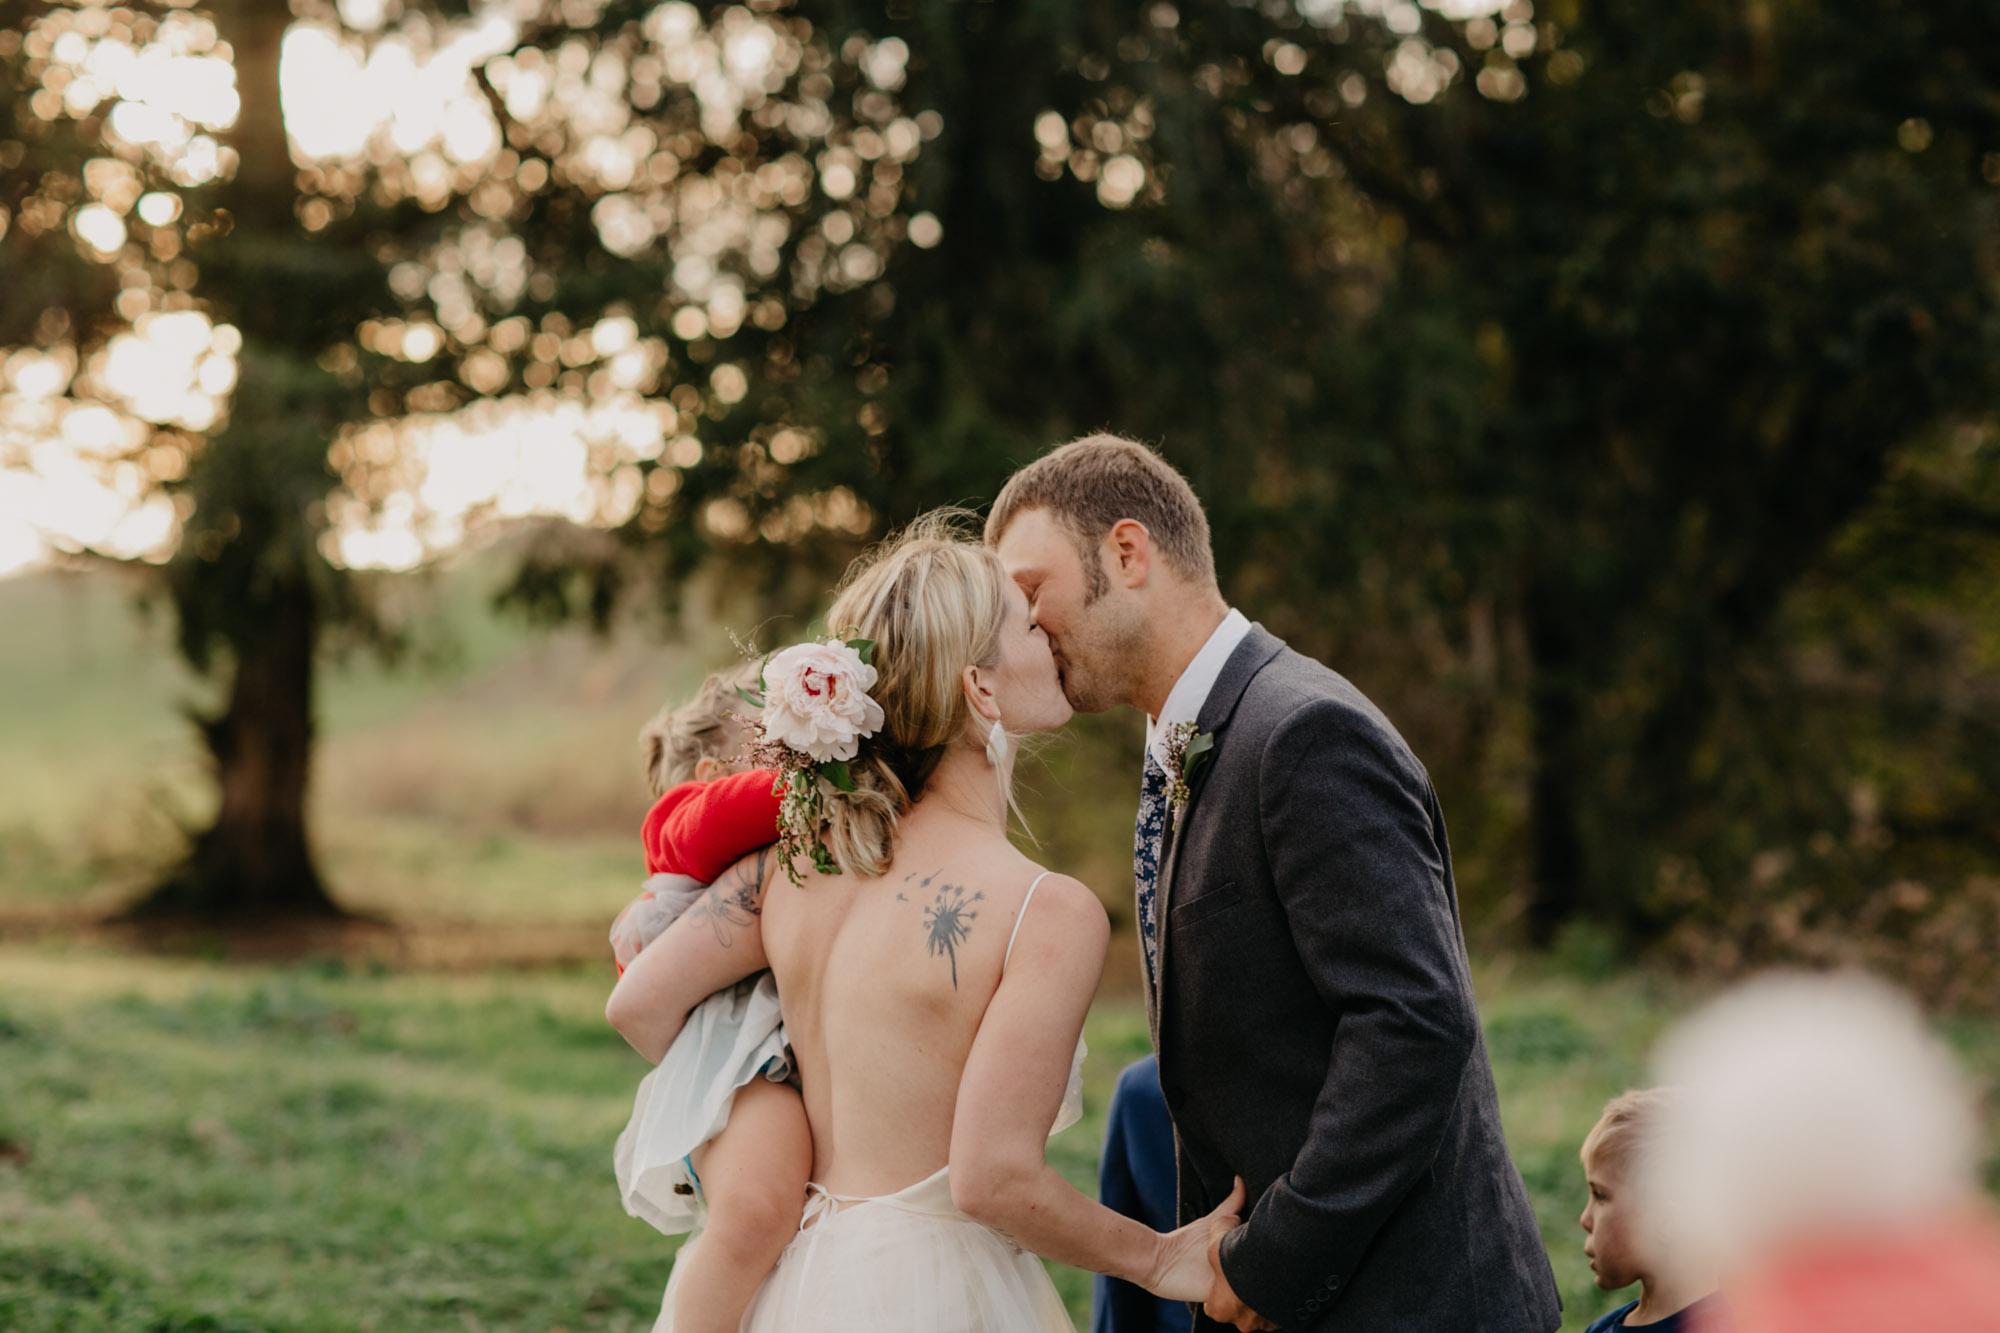 omaha-wedding-photographer-meghan-time-44.jpg